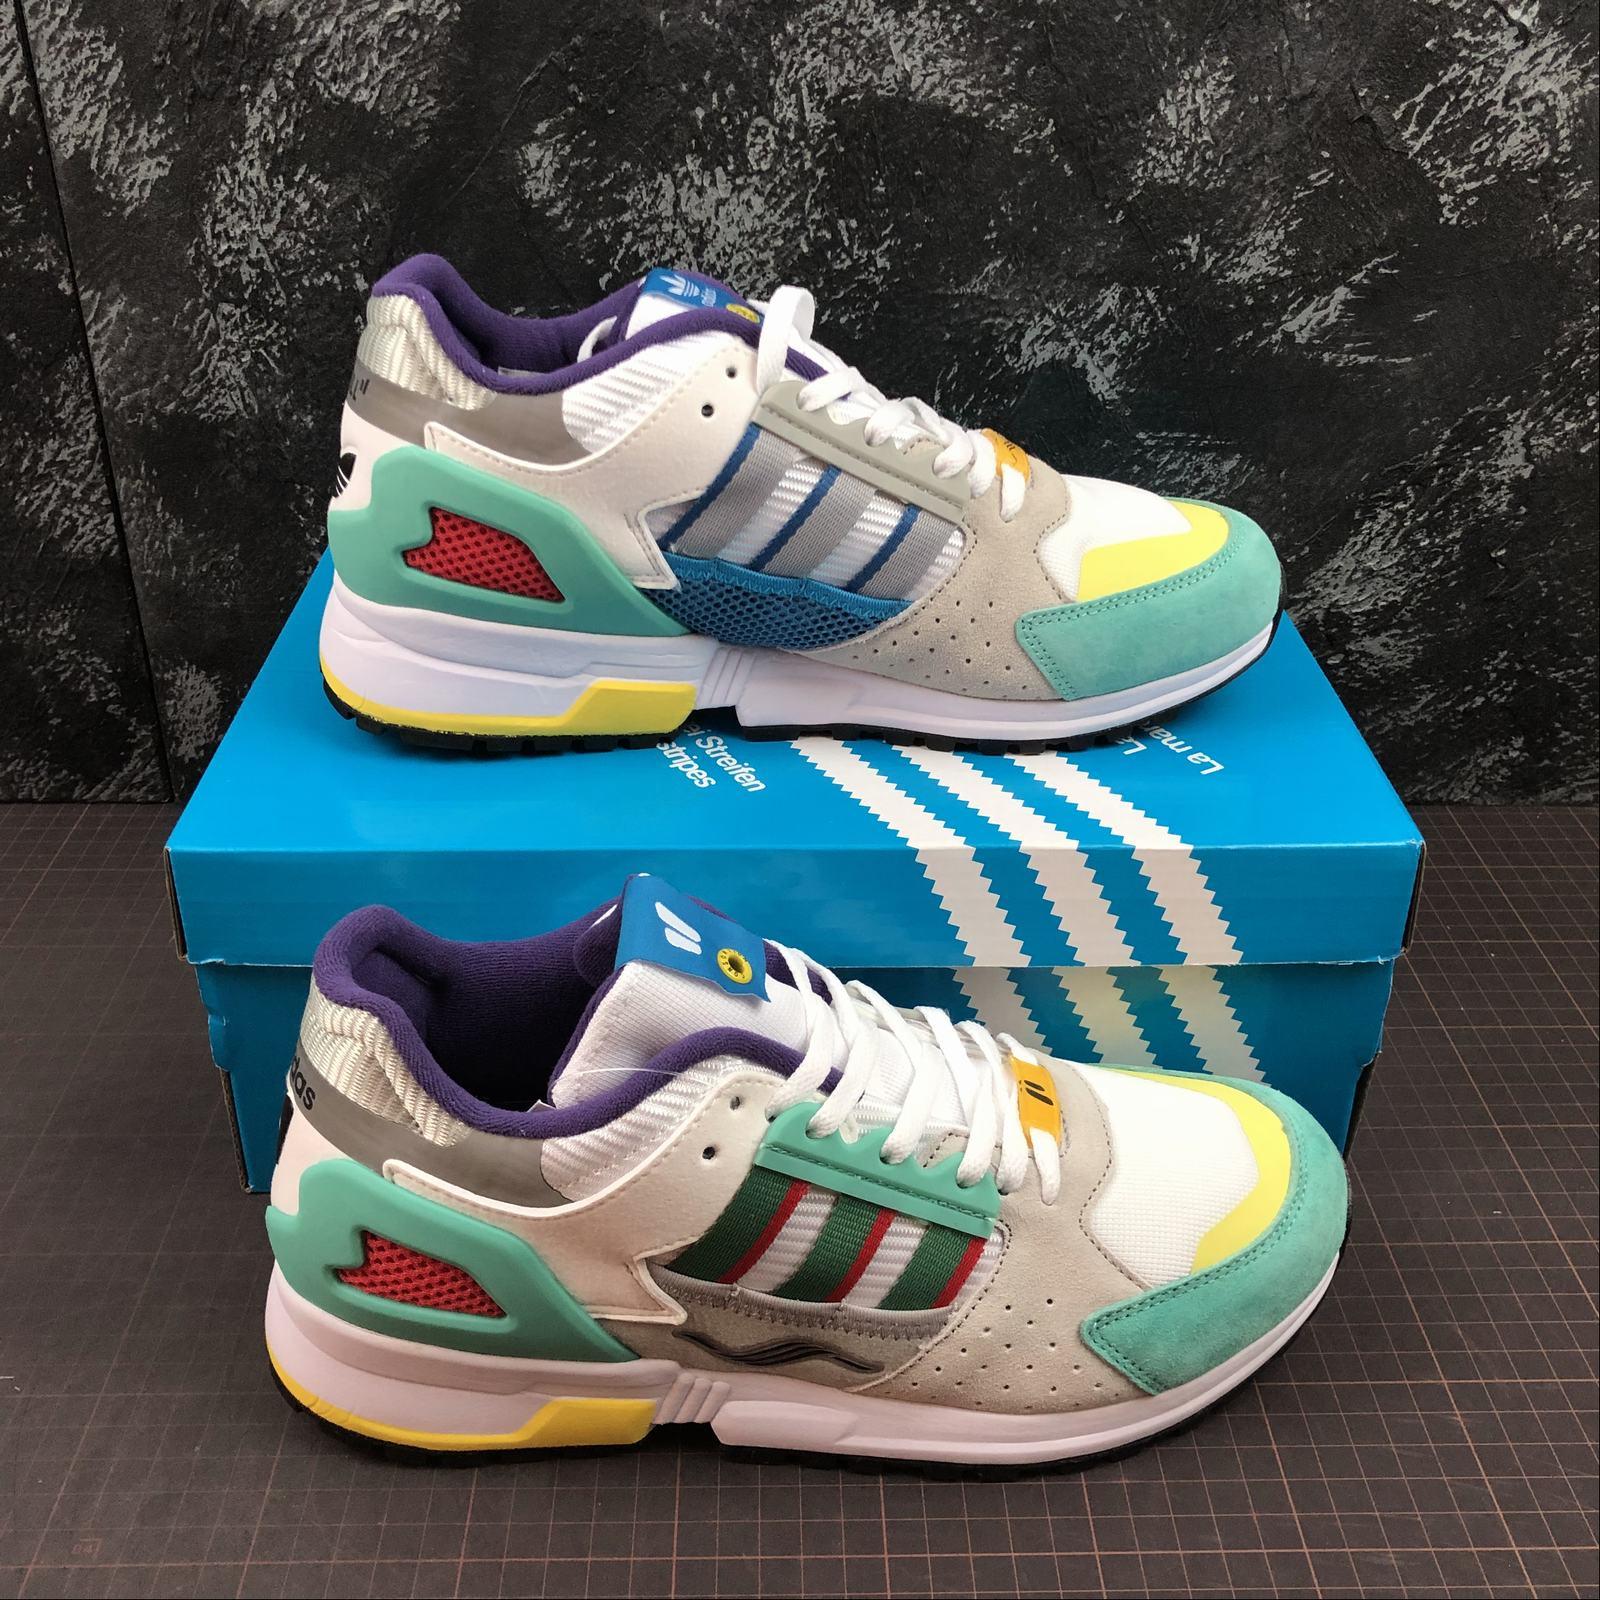 giay-sneaker-adidas-zx10000-c-ee9486